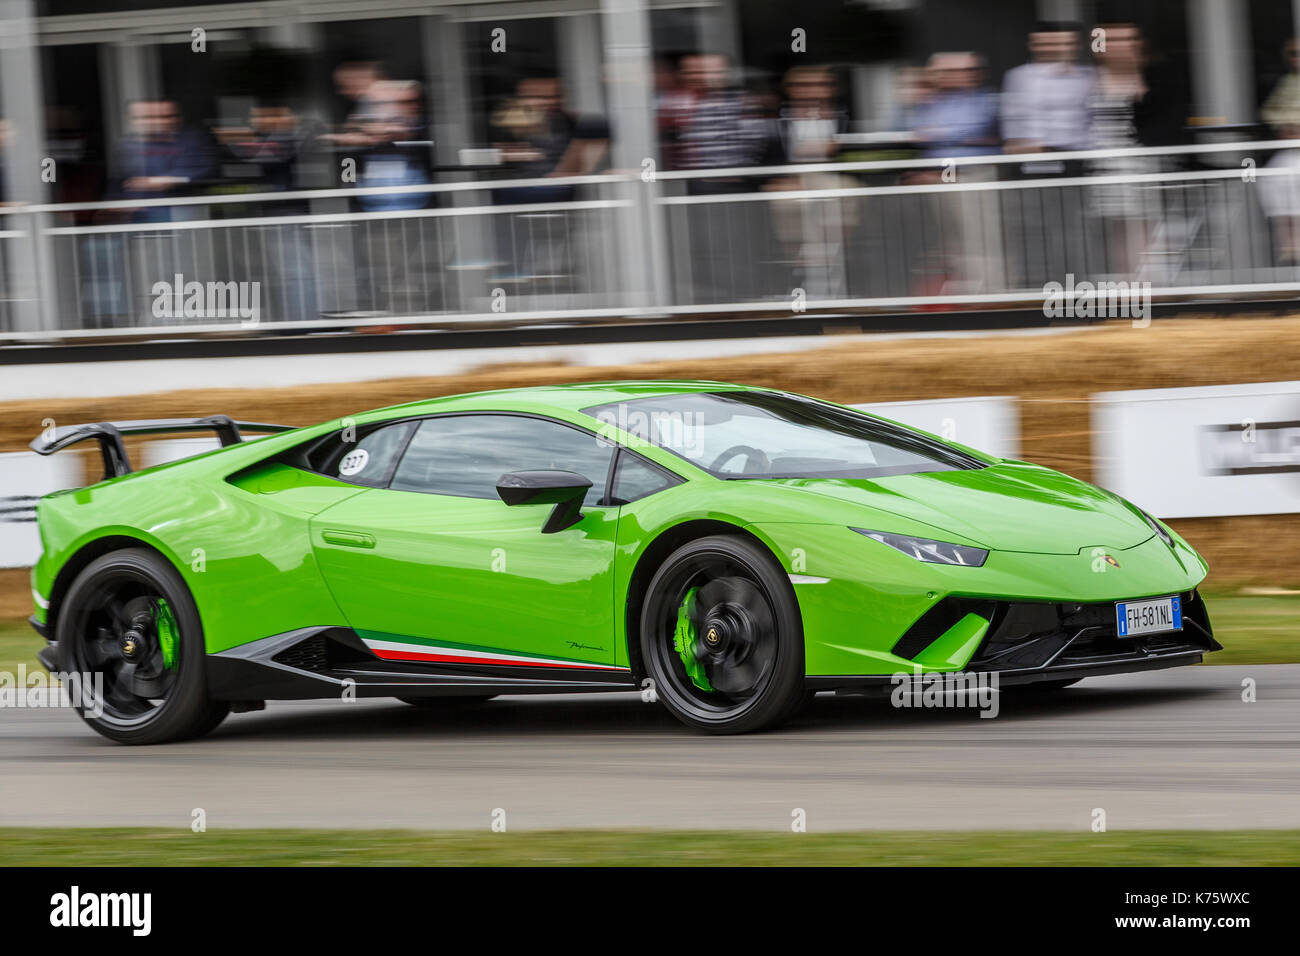 2017 Lamborghini Centenario Coupe At The 2017 Goodwood Festival Of